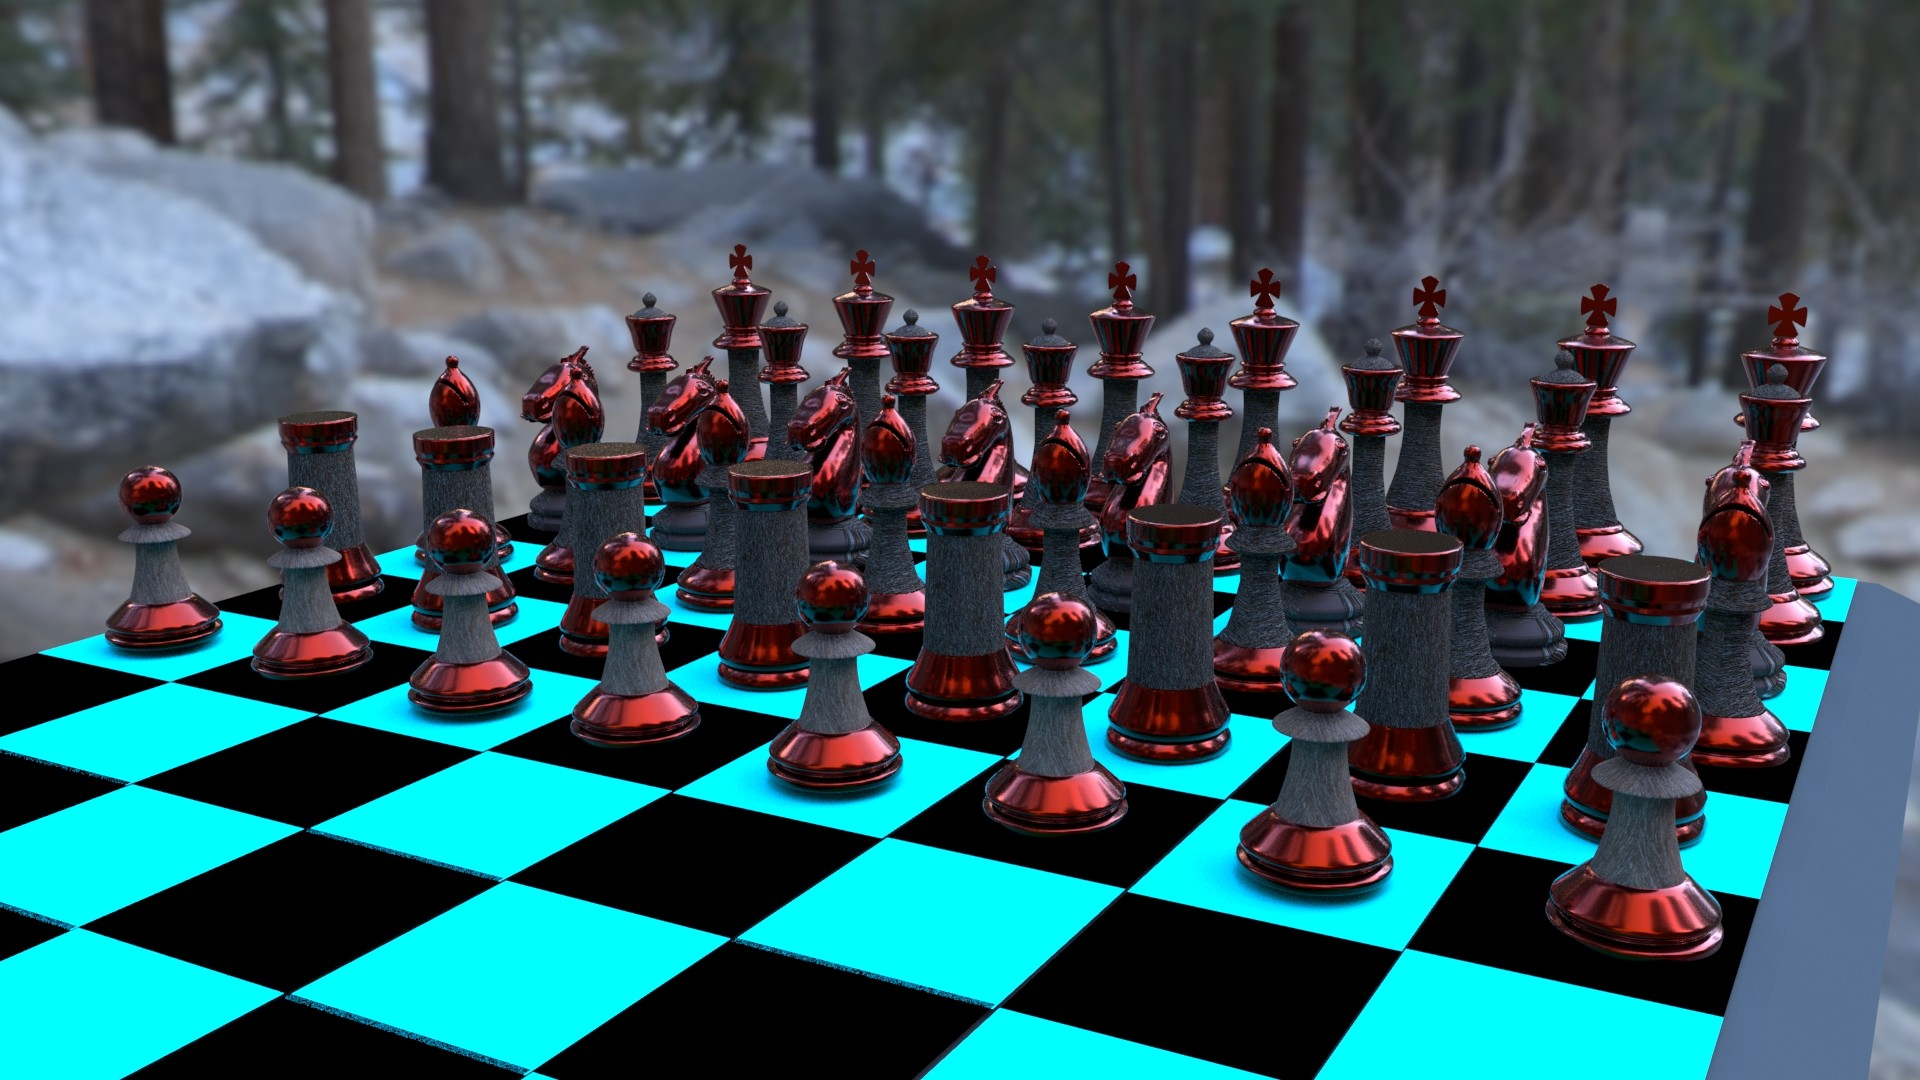 Kevn Palencia - Chess Board Project